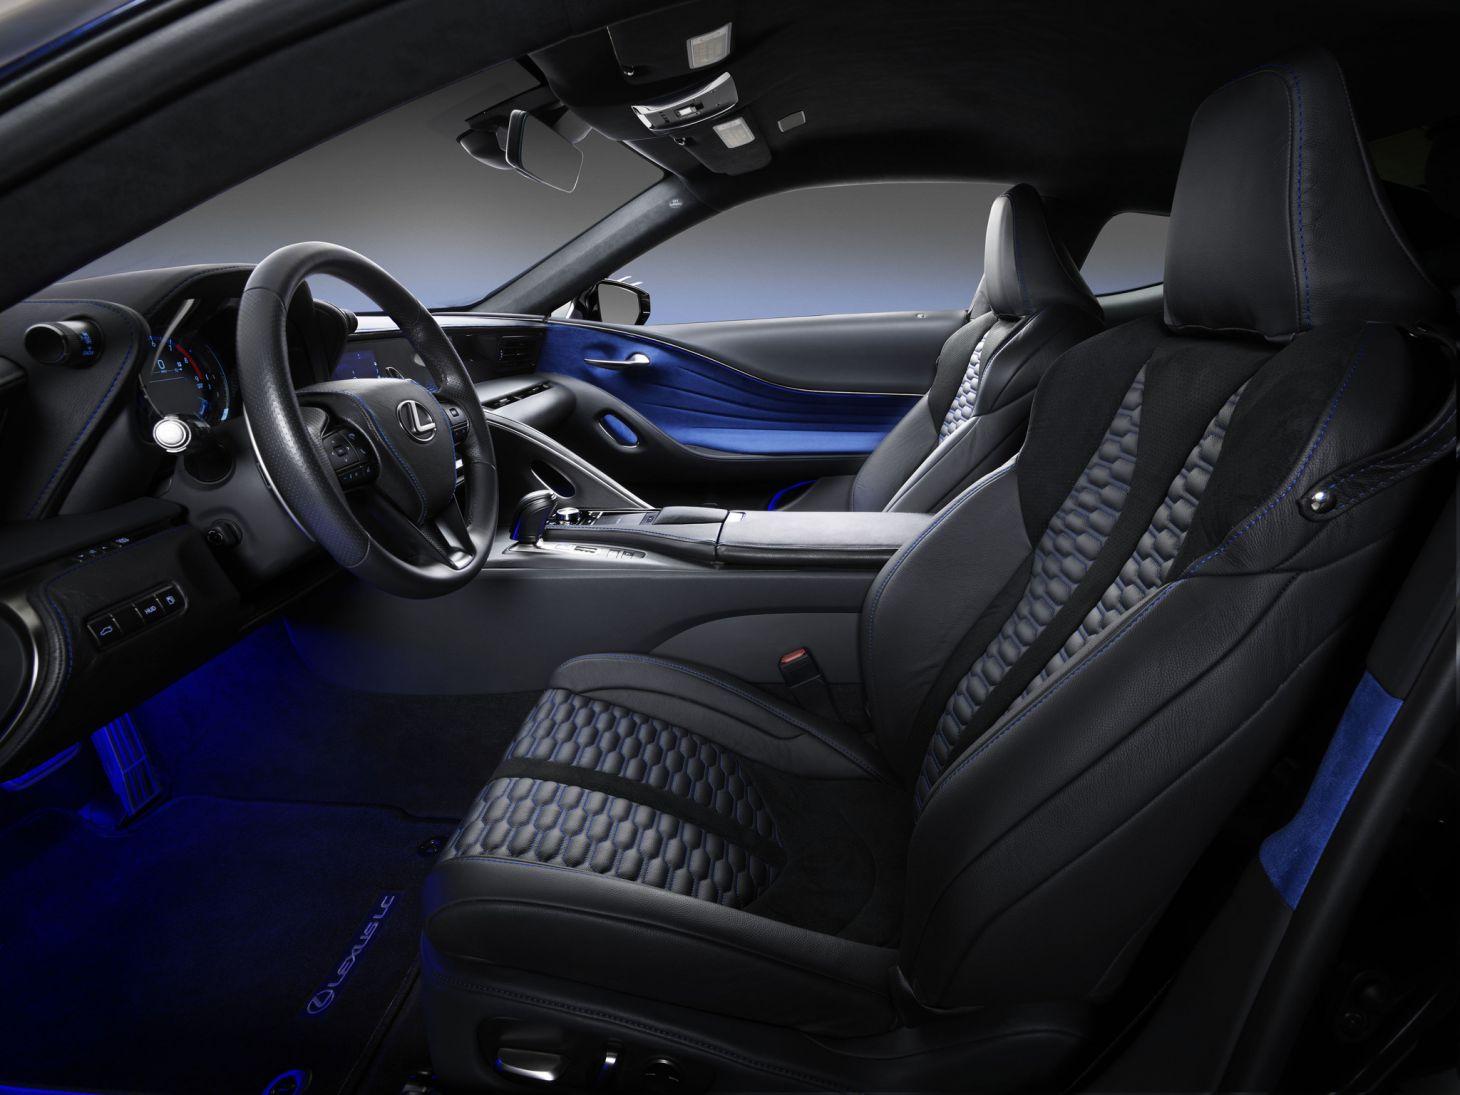 lexus_black_panther_inspired_lc_500_interior Carro do Pantera Negra: conheça o futurista Lexus LC 500